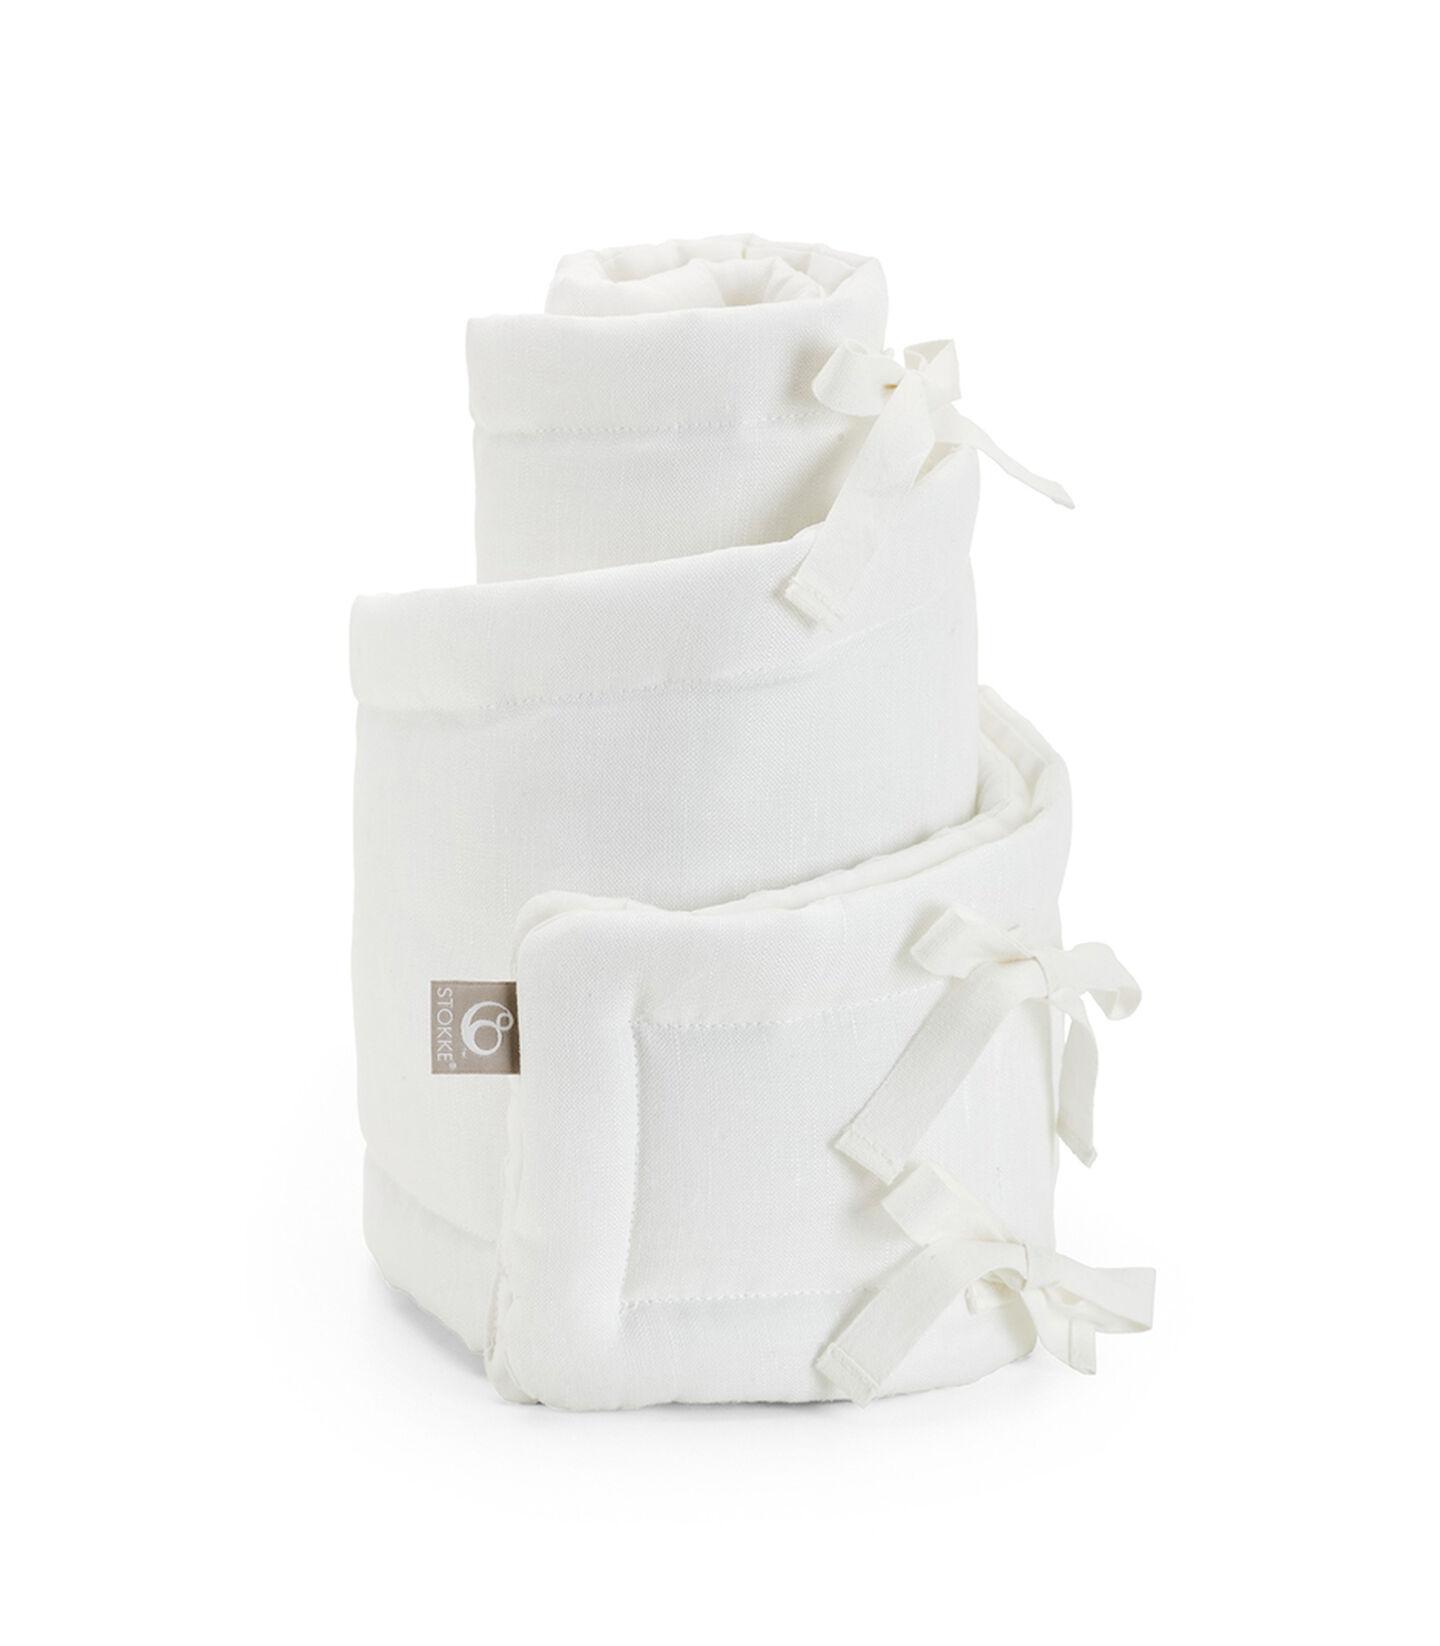 Stokke® Sleepi™ Mini Bumper White, Blanco, mainview view 2